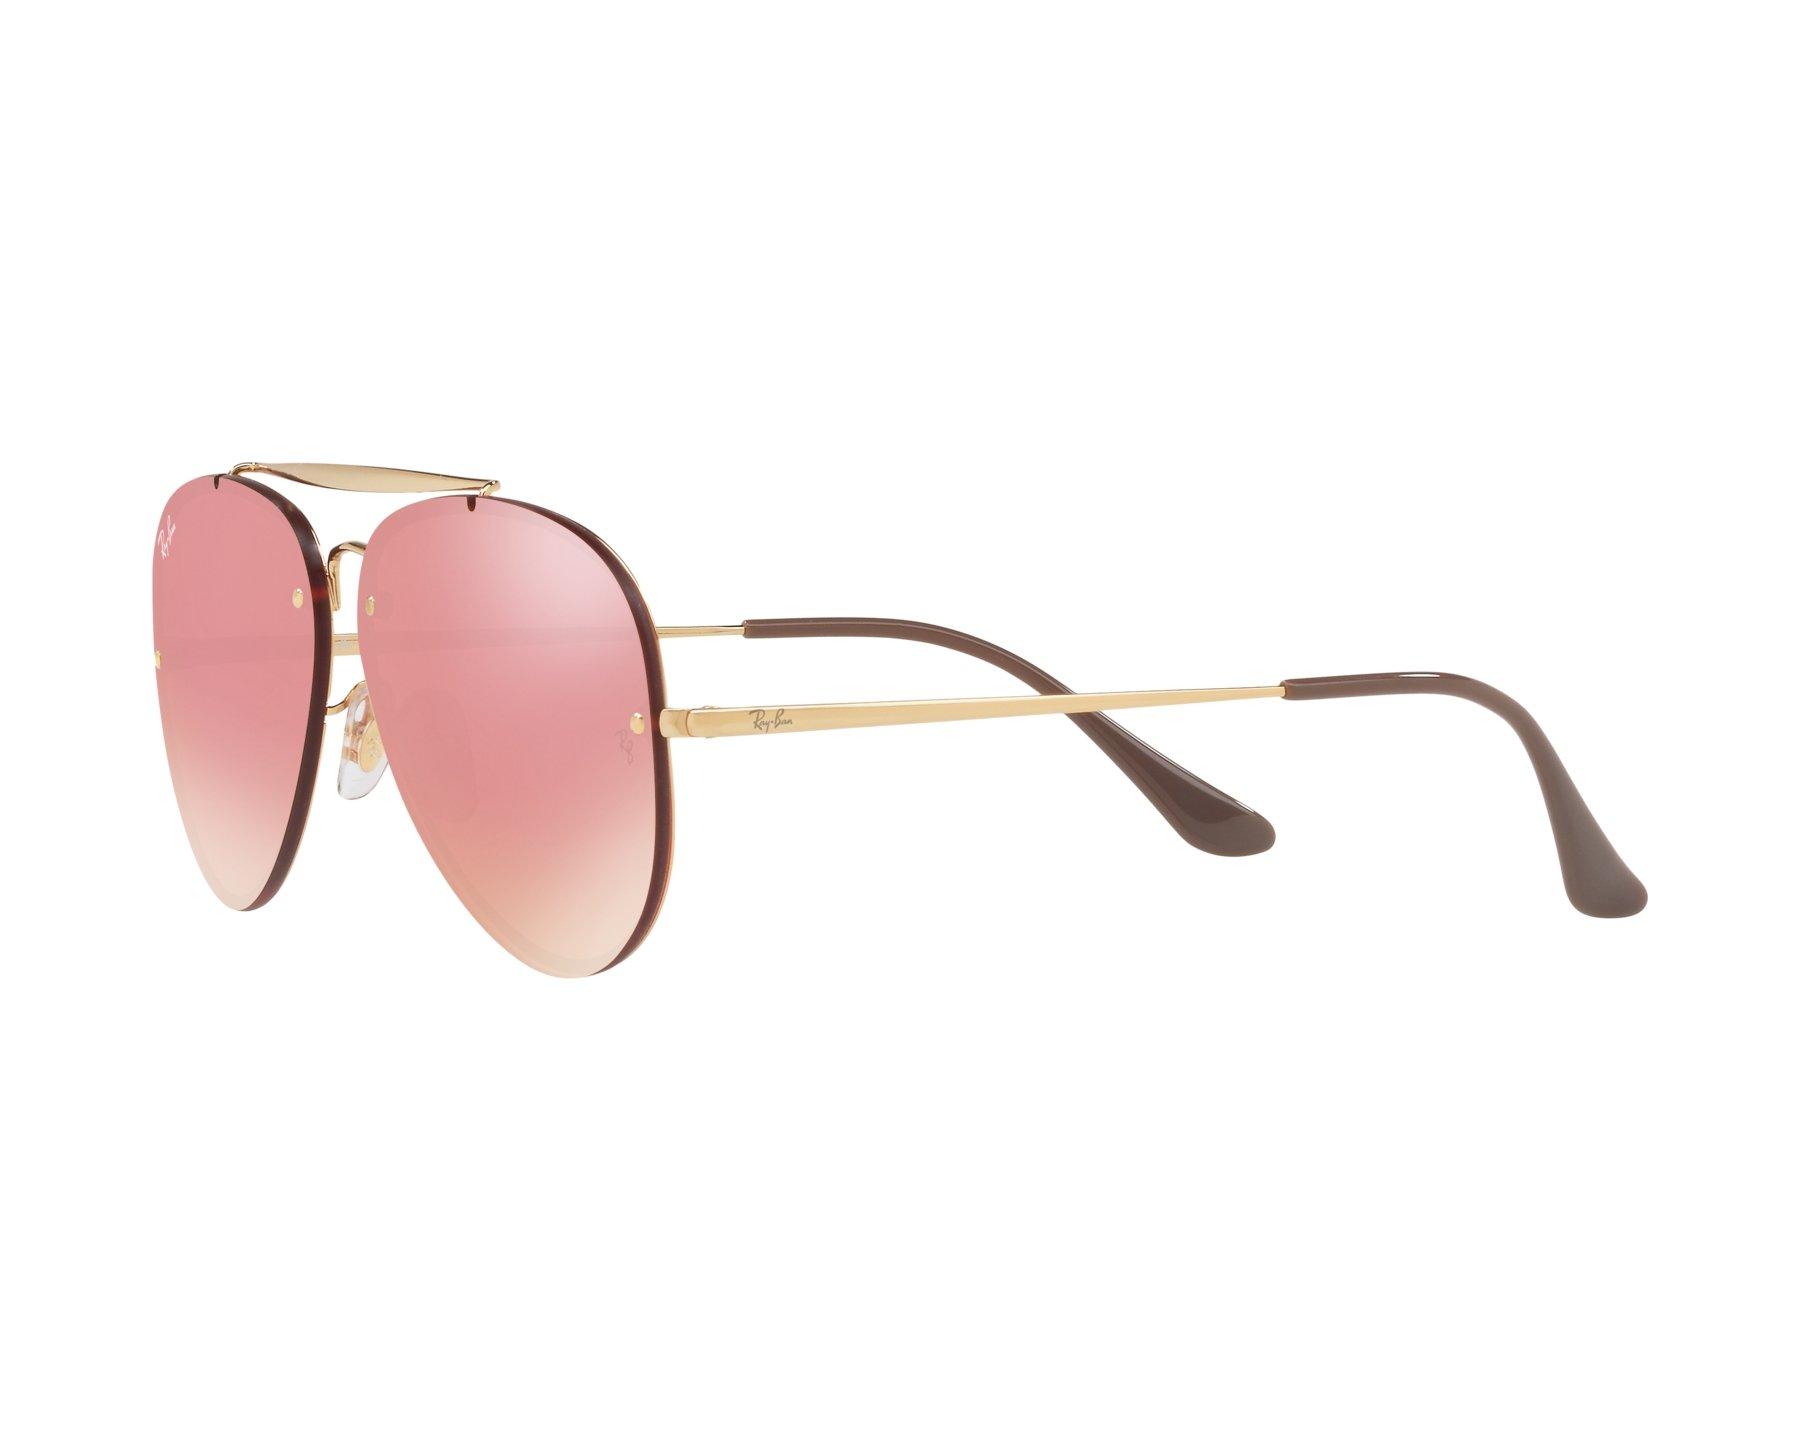 Sunglasses Ray-Ban RB-3584-N 9052E4 61-13 Gold 360 degree 0fb86fd7d897